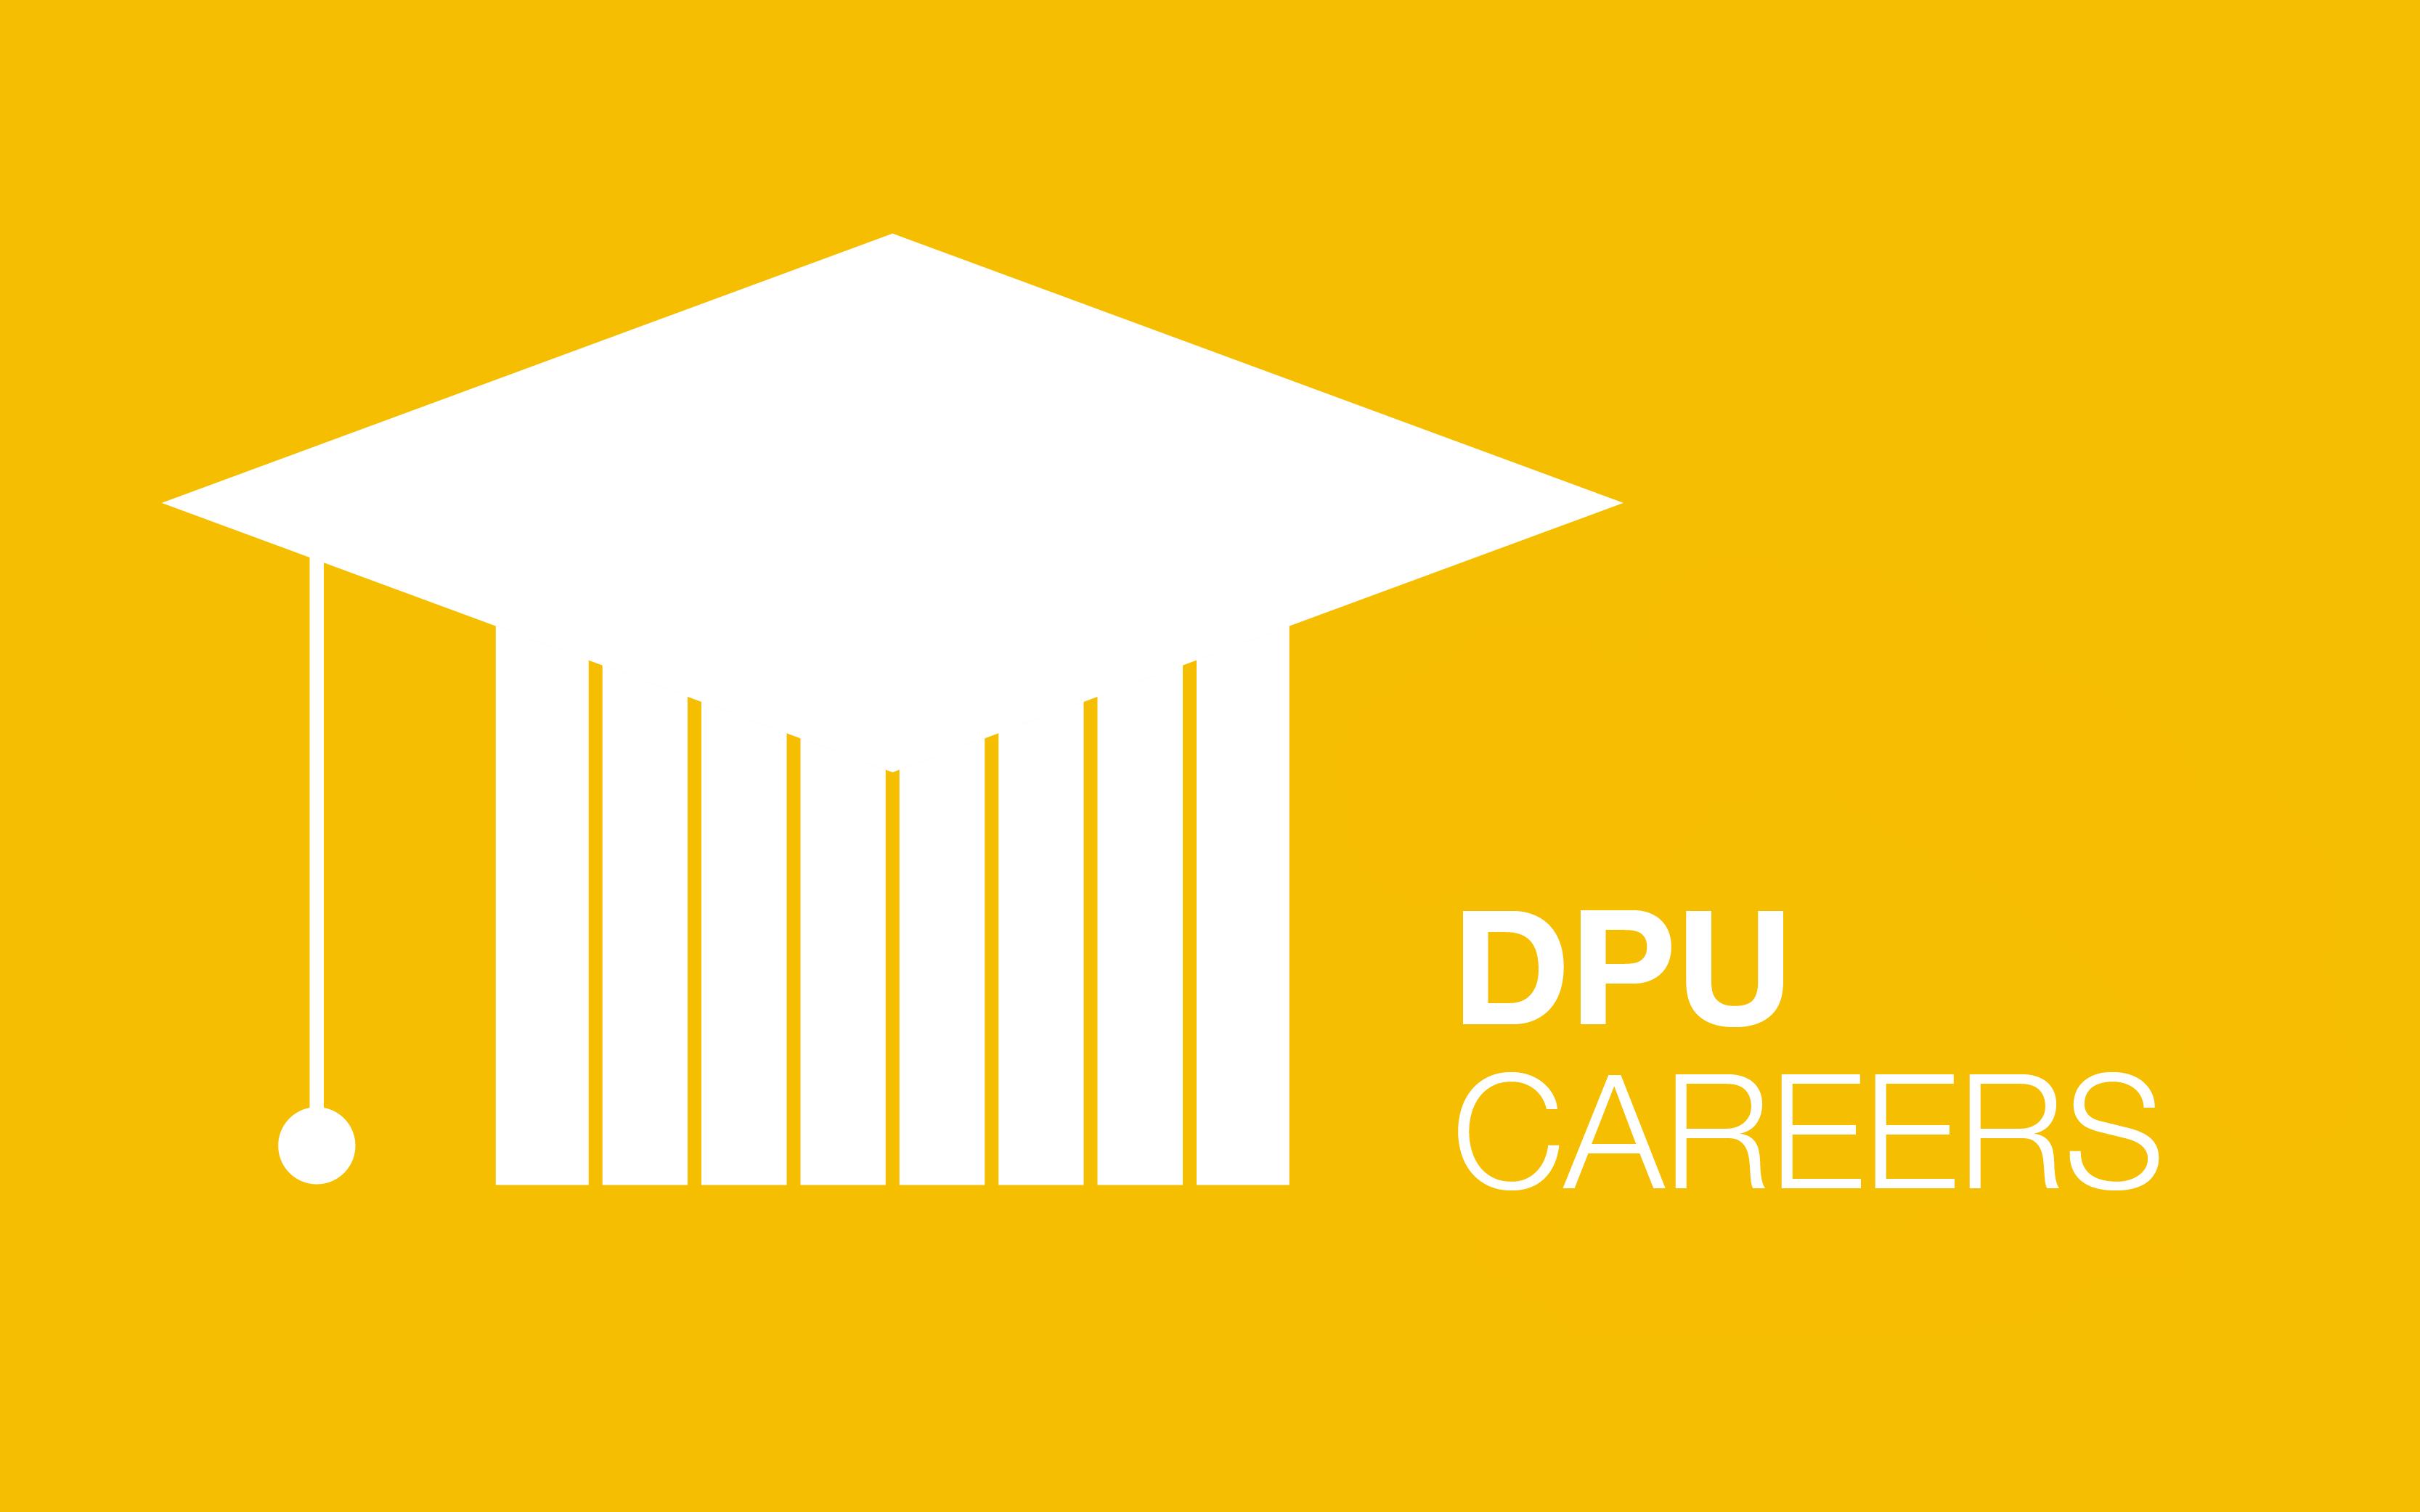 dpu careers